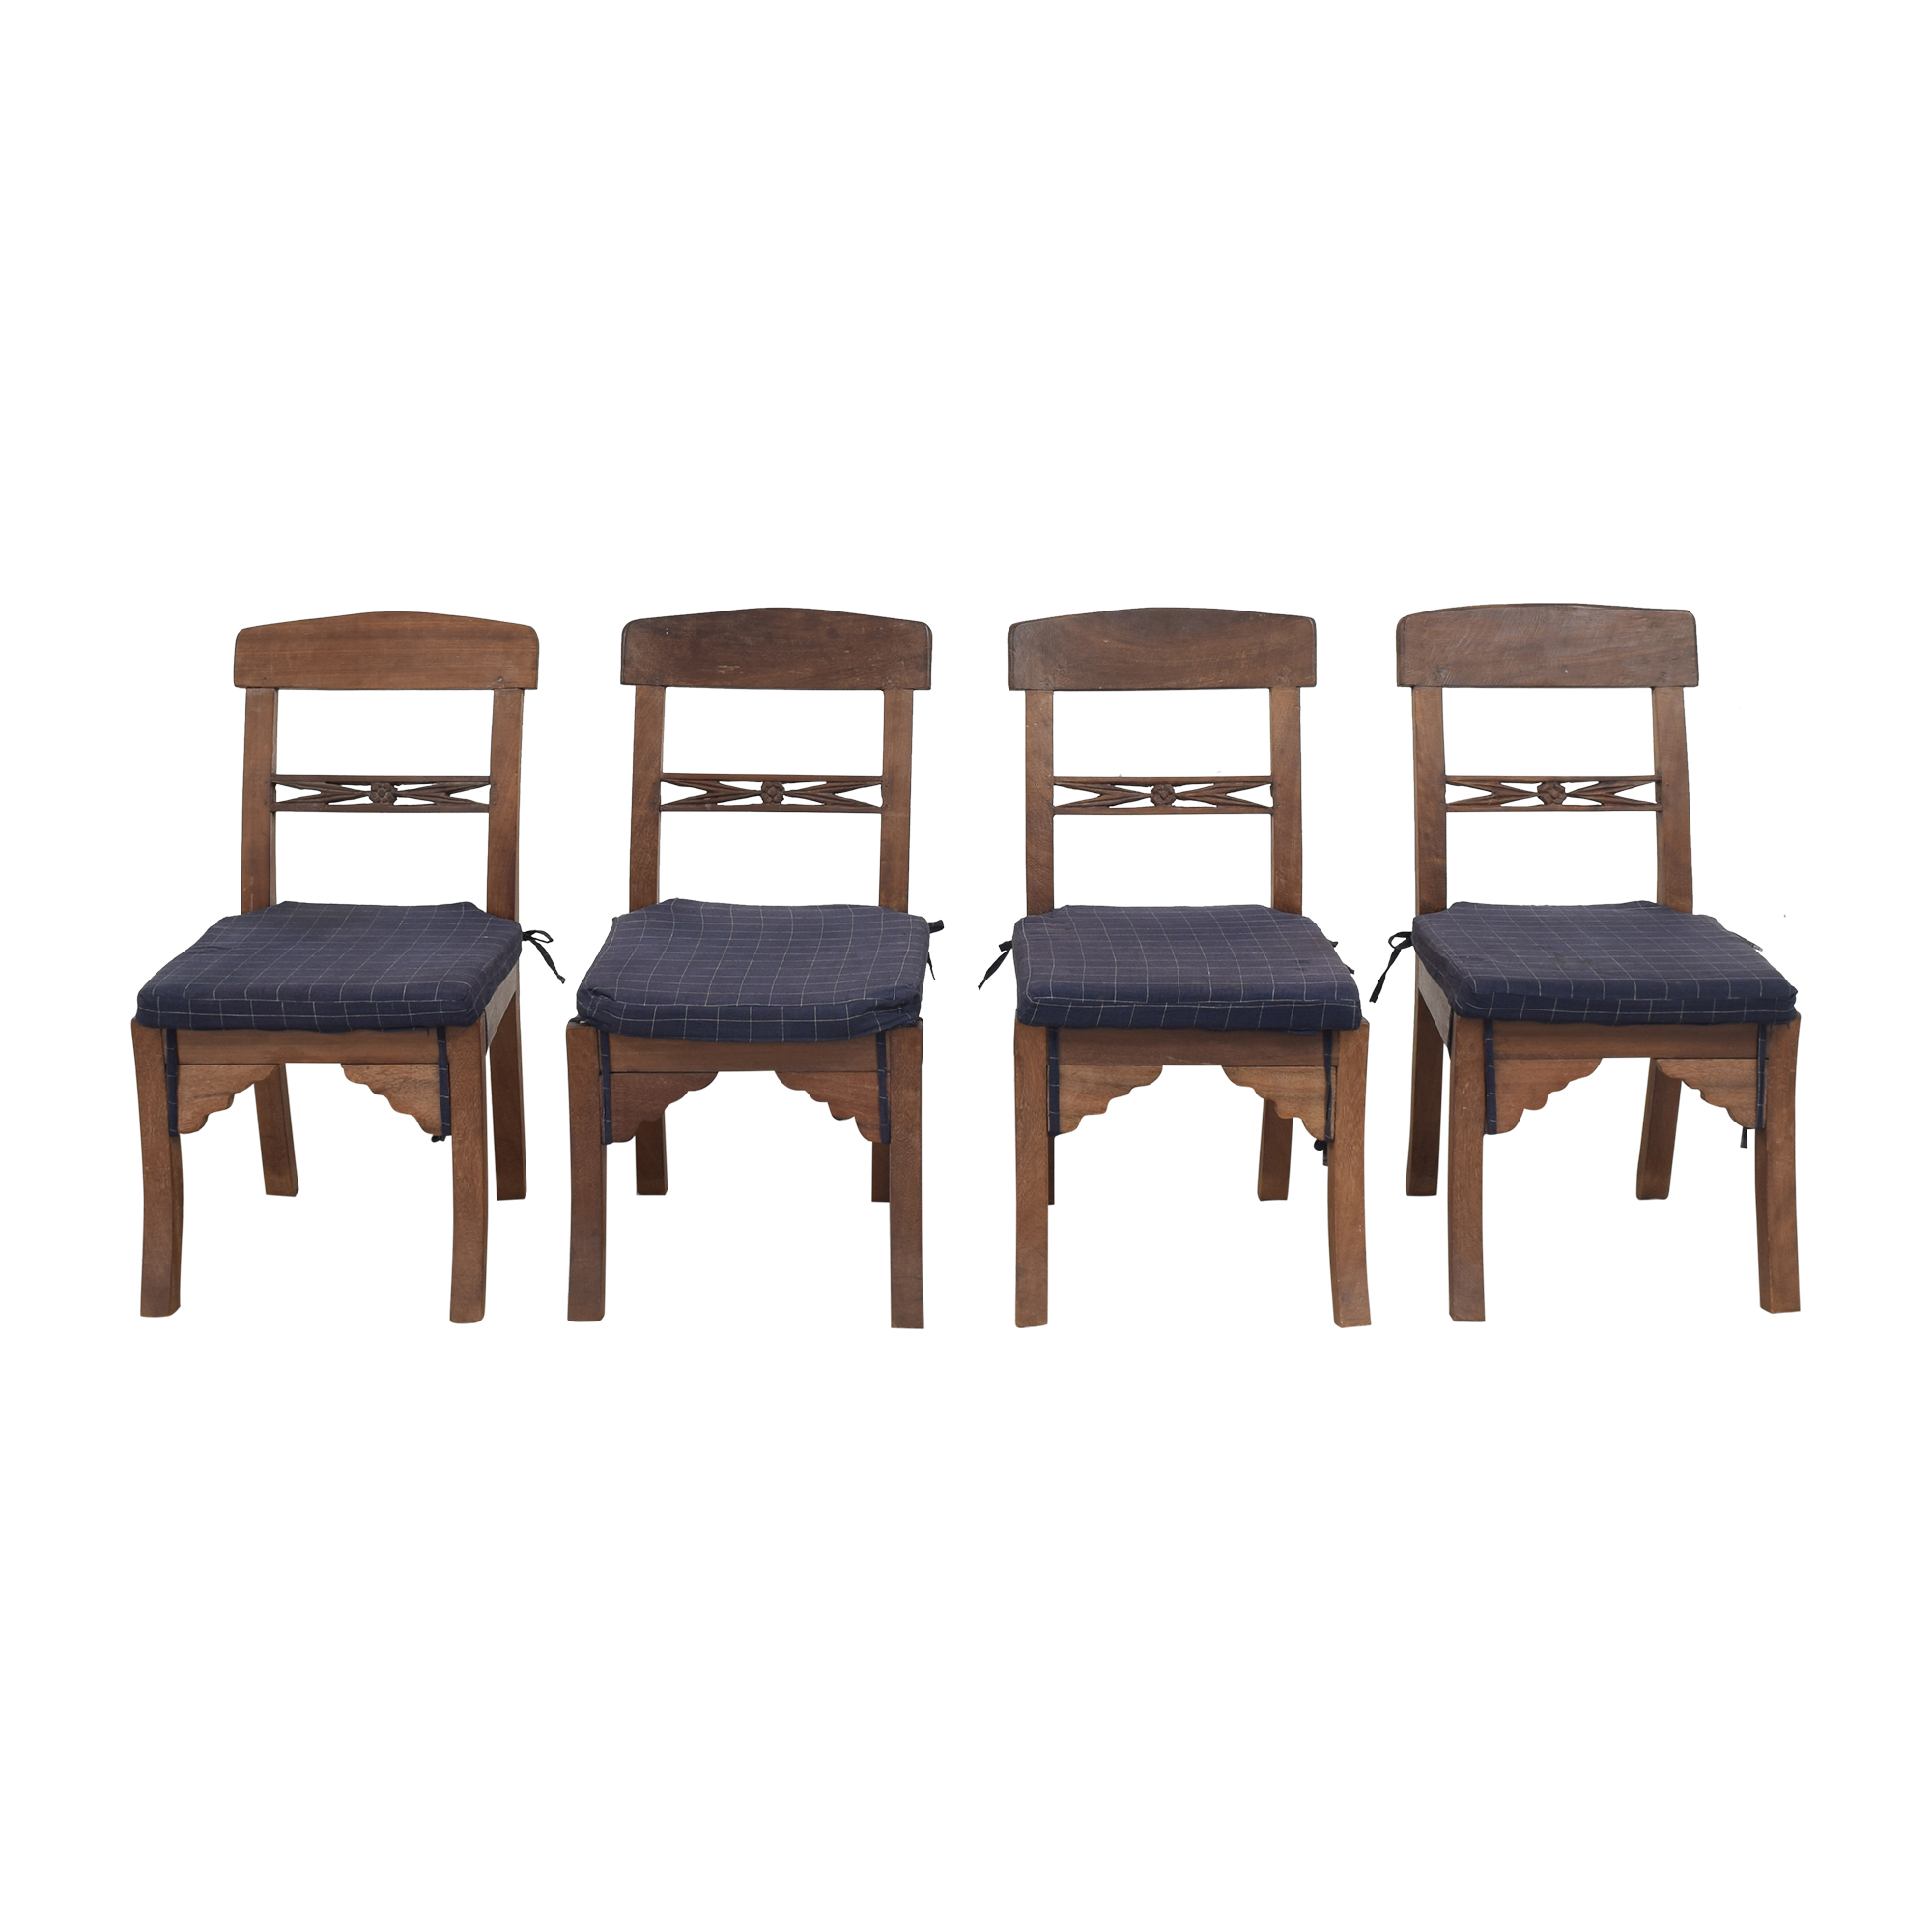 Custom Dining Chairs used